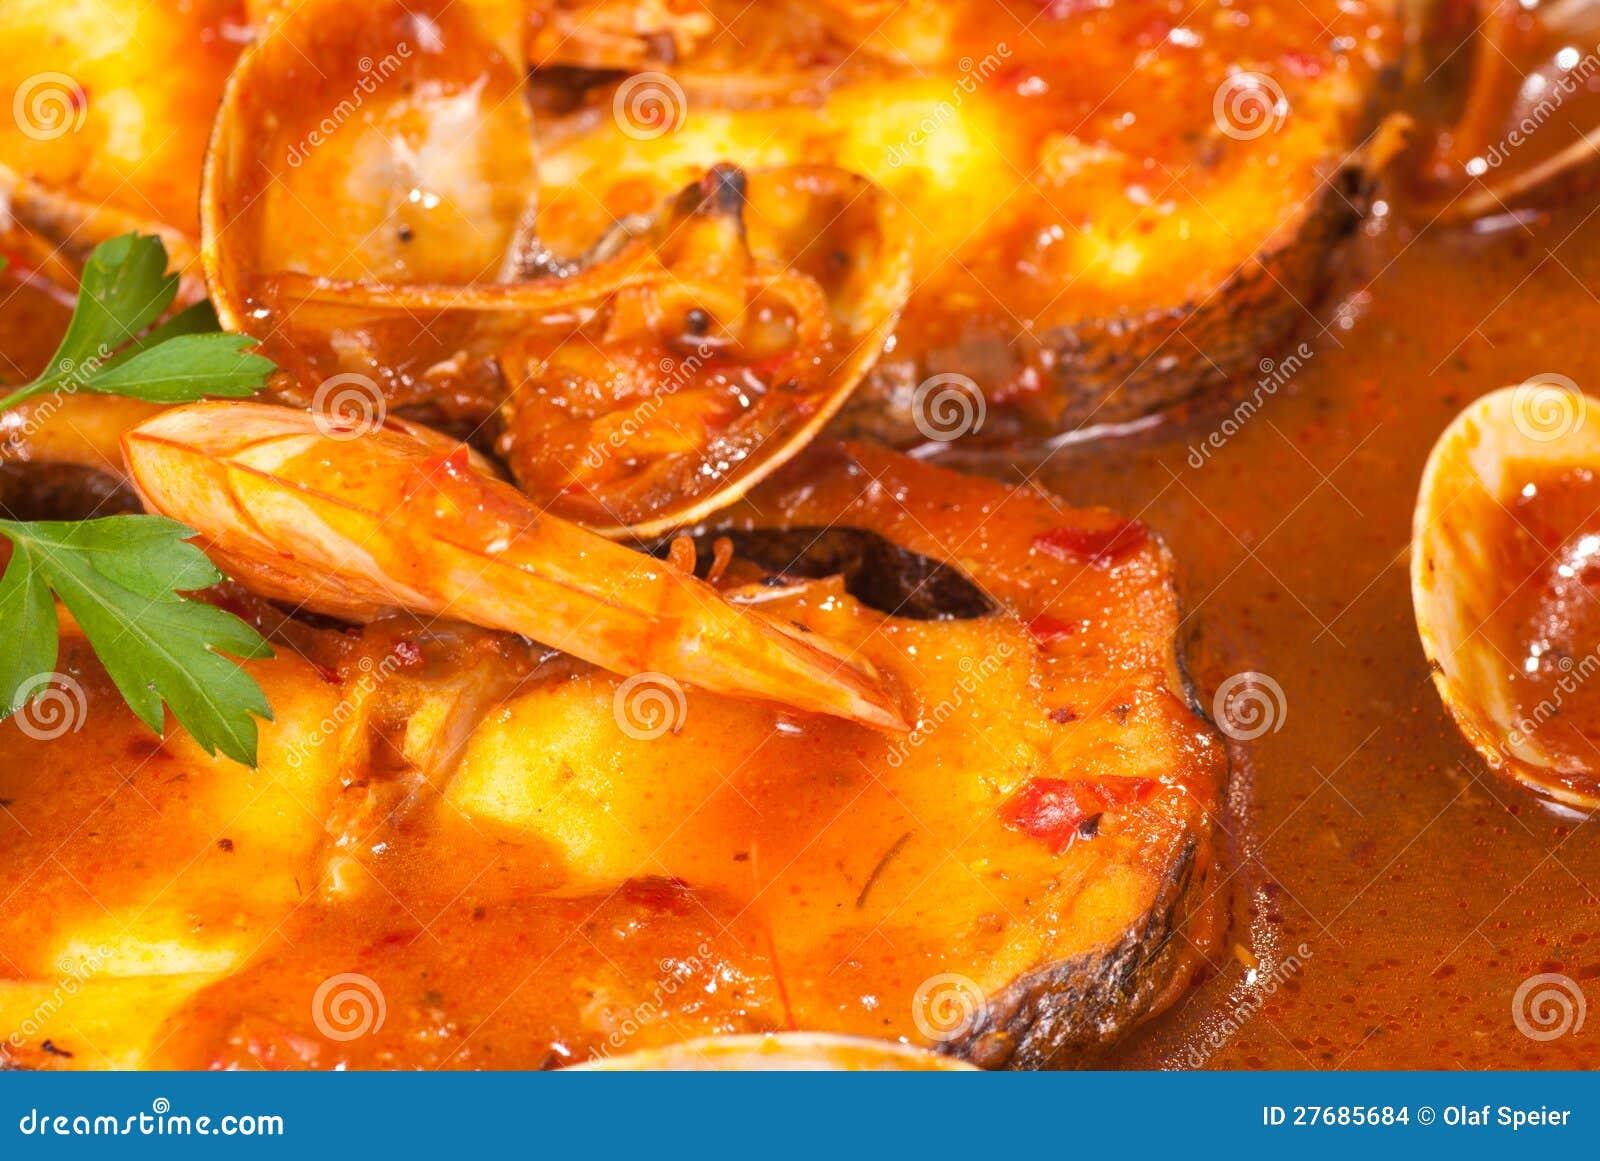 Merluza en salsa de la sidra